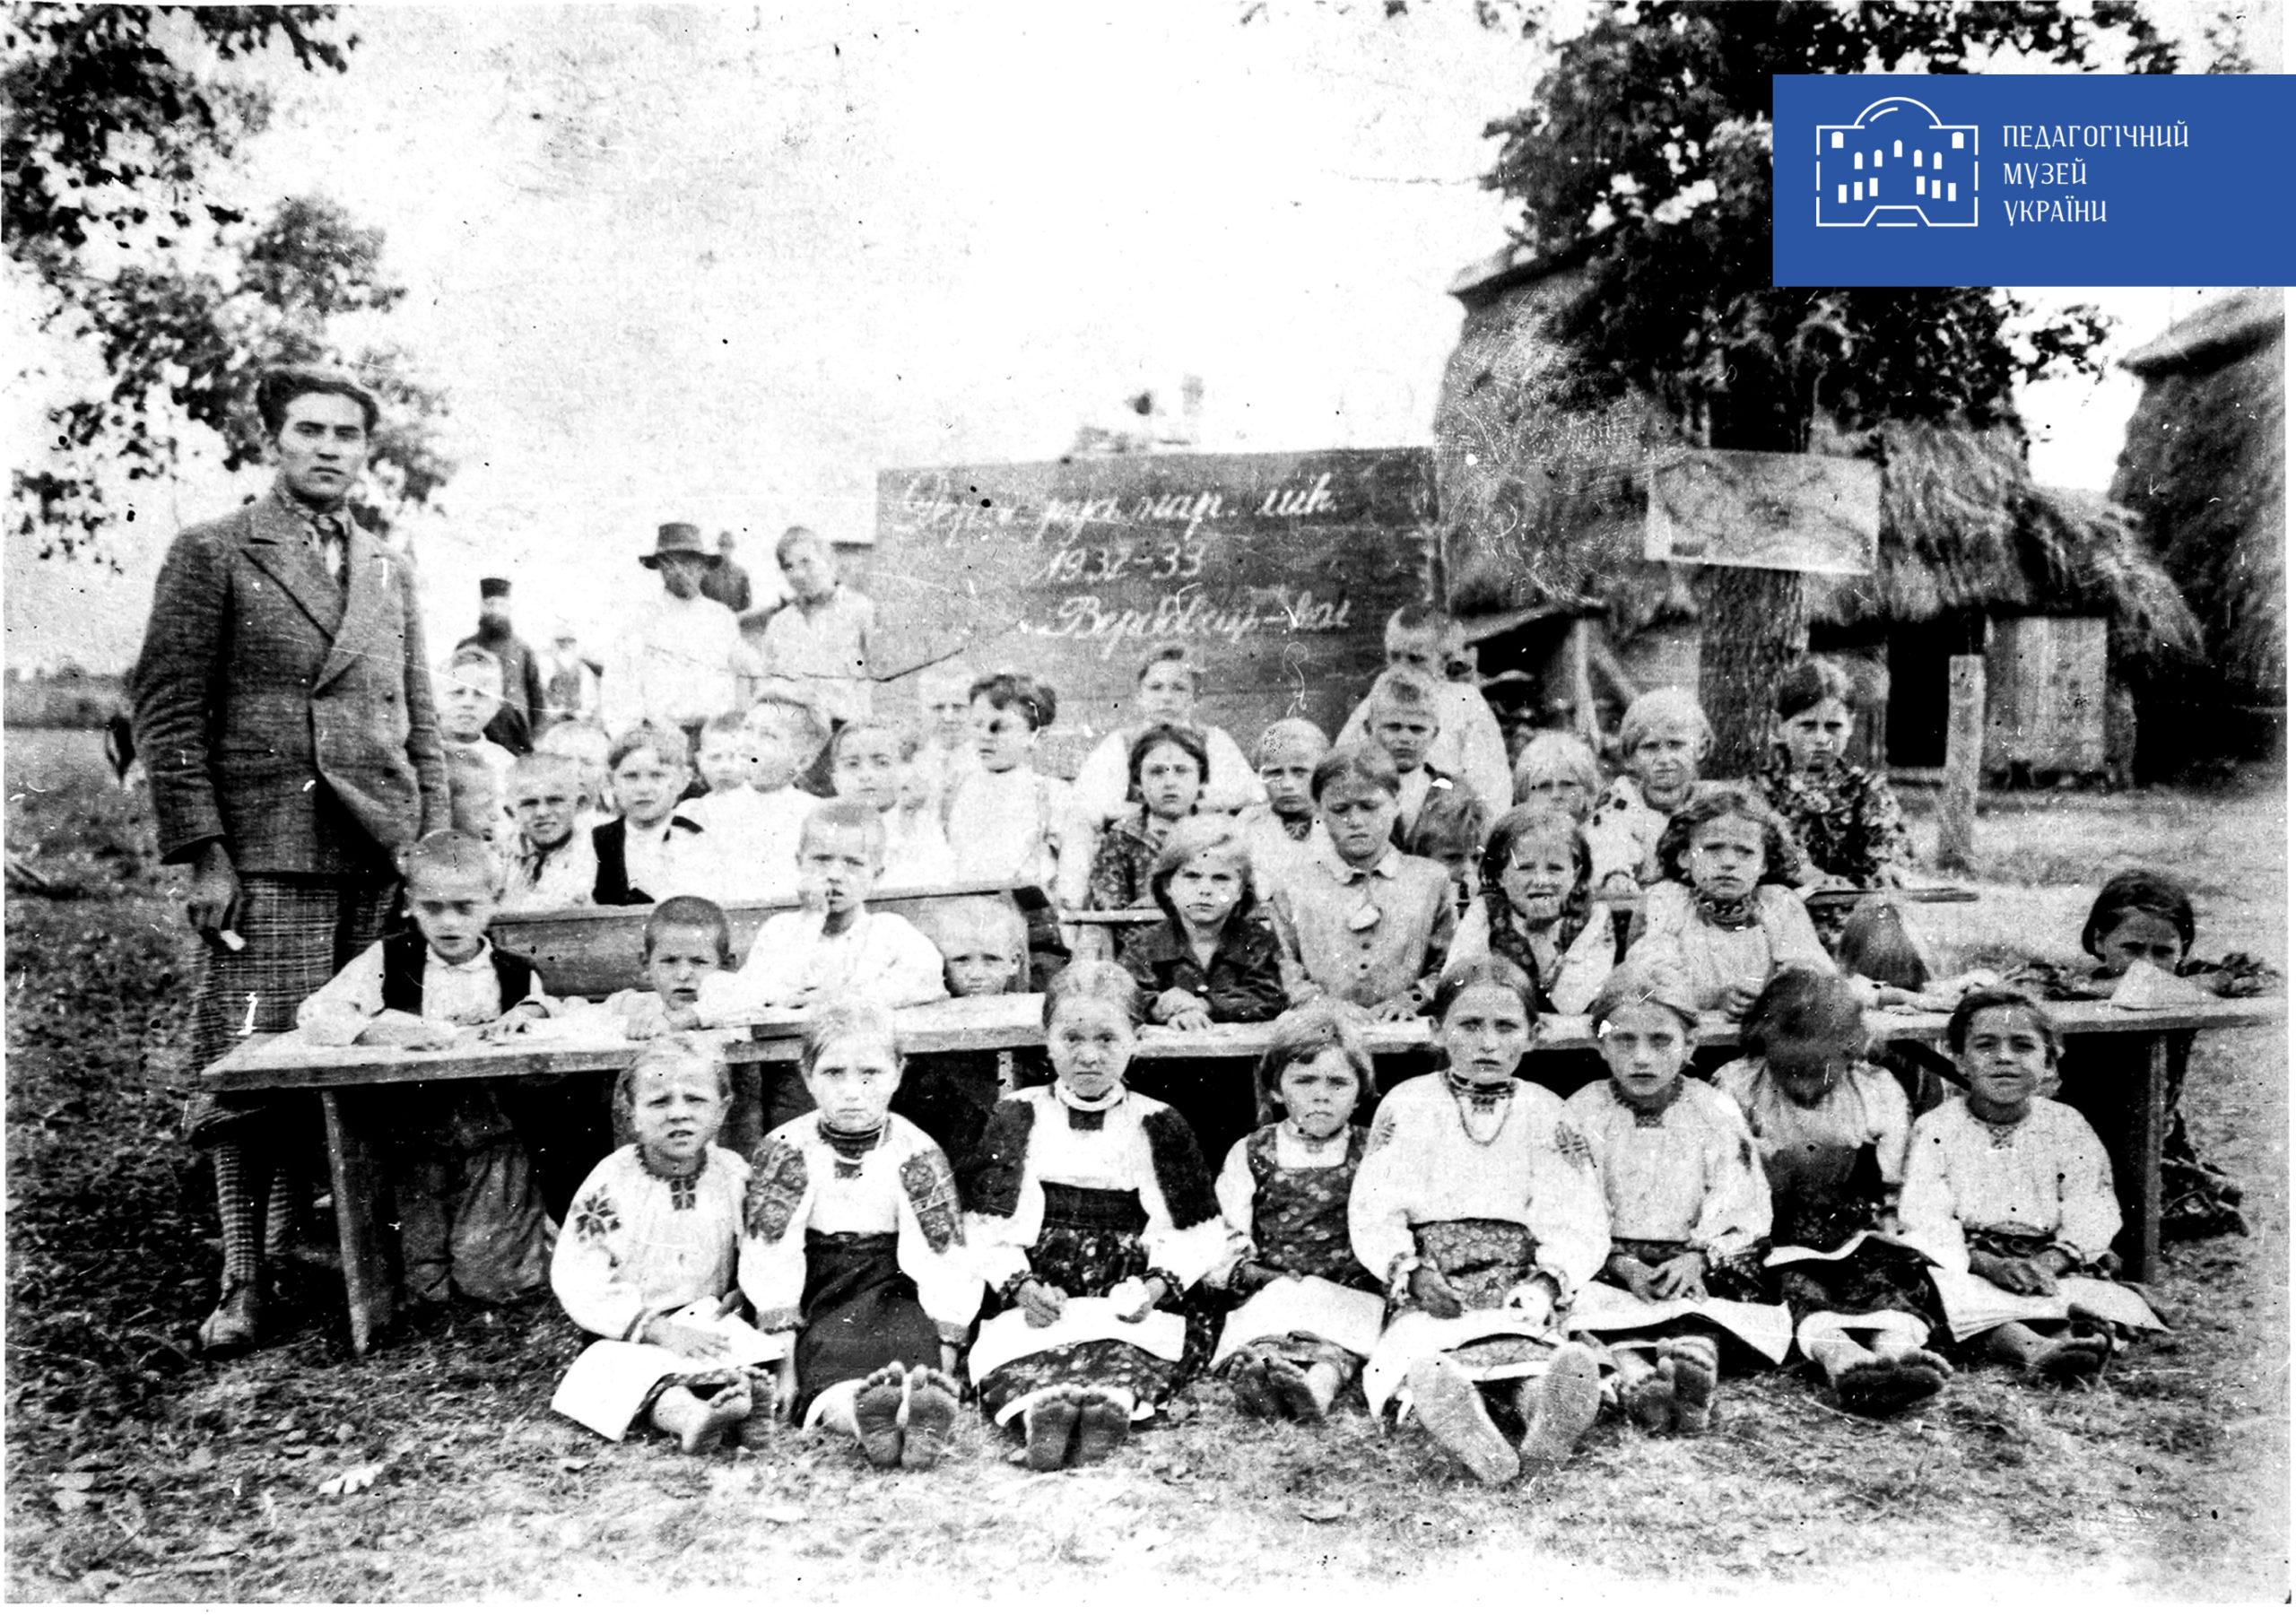 Початок навчального року в сільській школі. Закарпатська обл. 1932 р. Фотокомплекс. Папка «20-40 рр. ХХ ст». Фото № 43. Офсет чорно-білий.